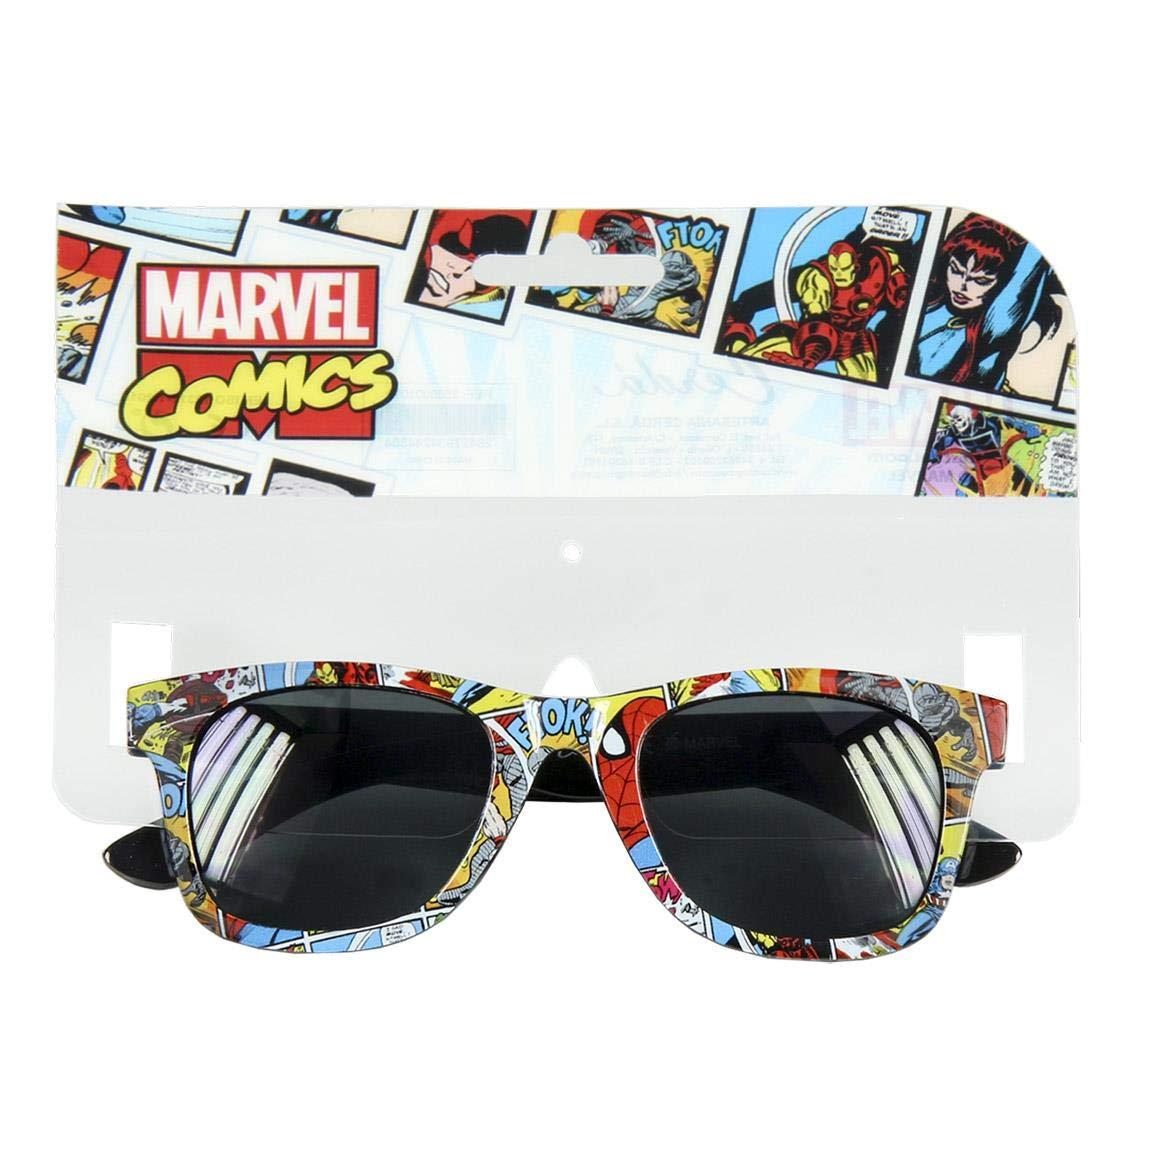 52 Bambina Artesania Cerda Gafas De sol Marvel Occhiali da Sole Nero Negro